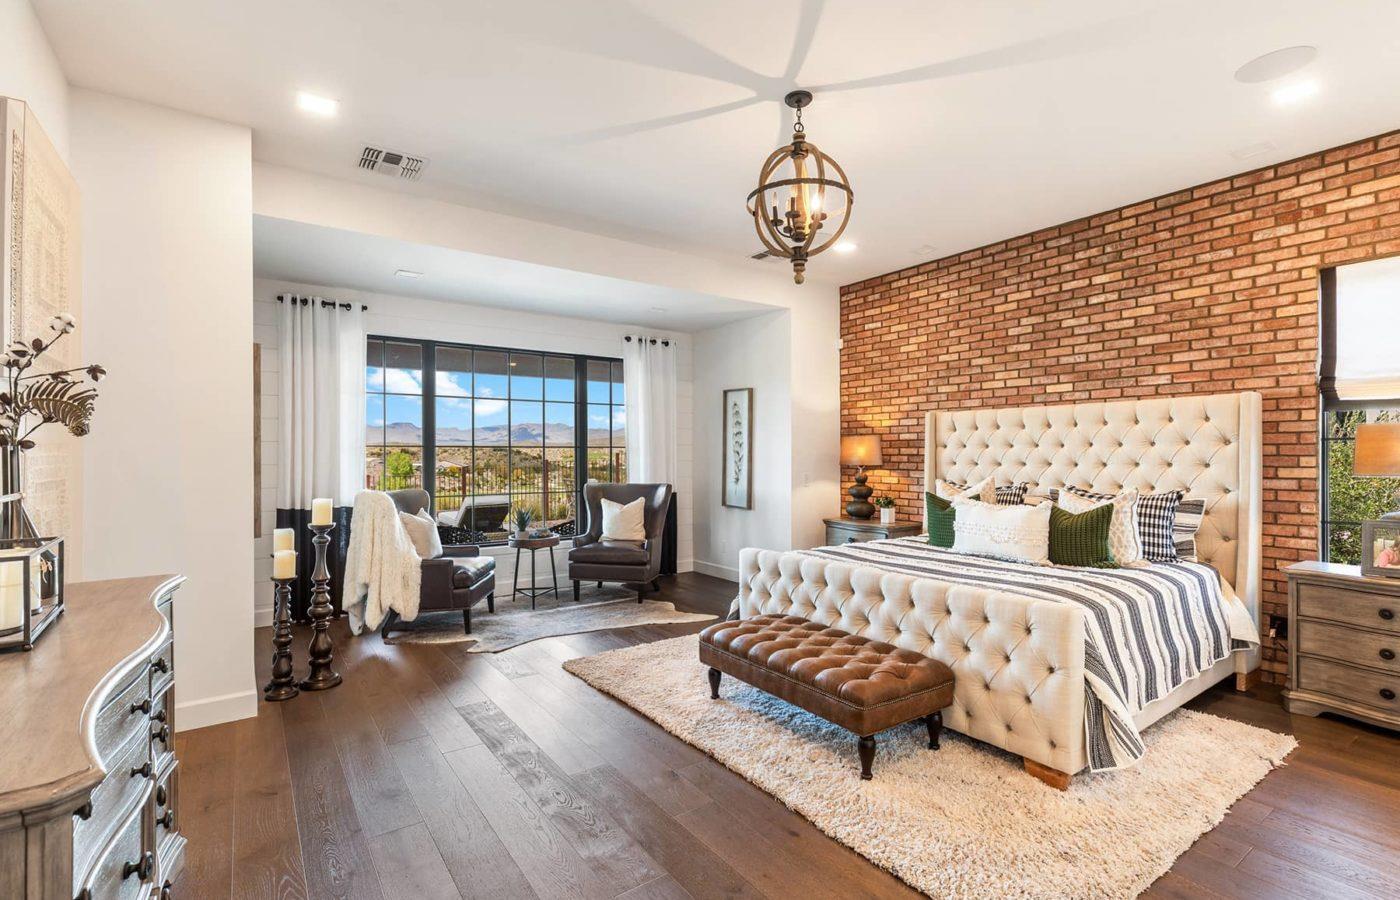 Bedroom featured in the Sundance By CS Edmunds in Phoenix-Mesa, AZ